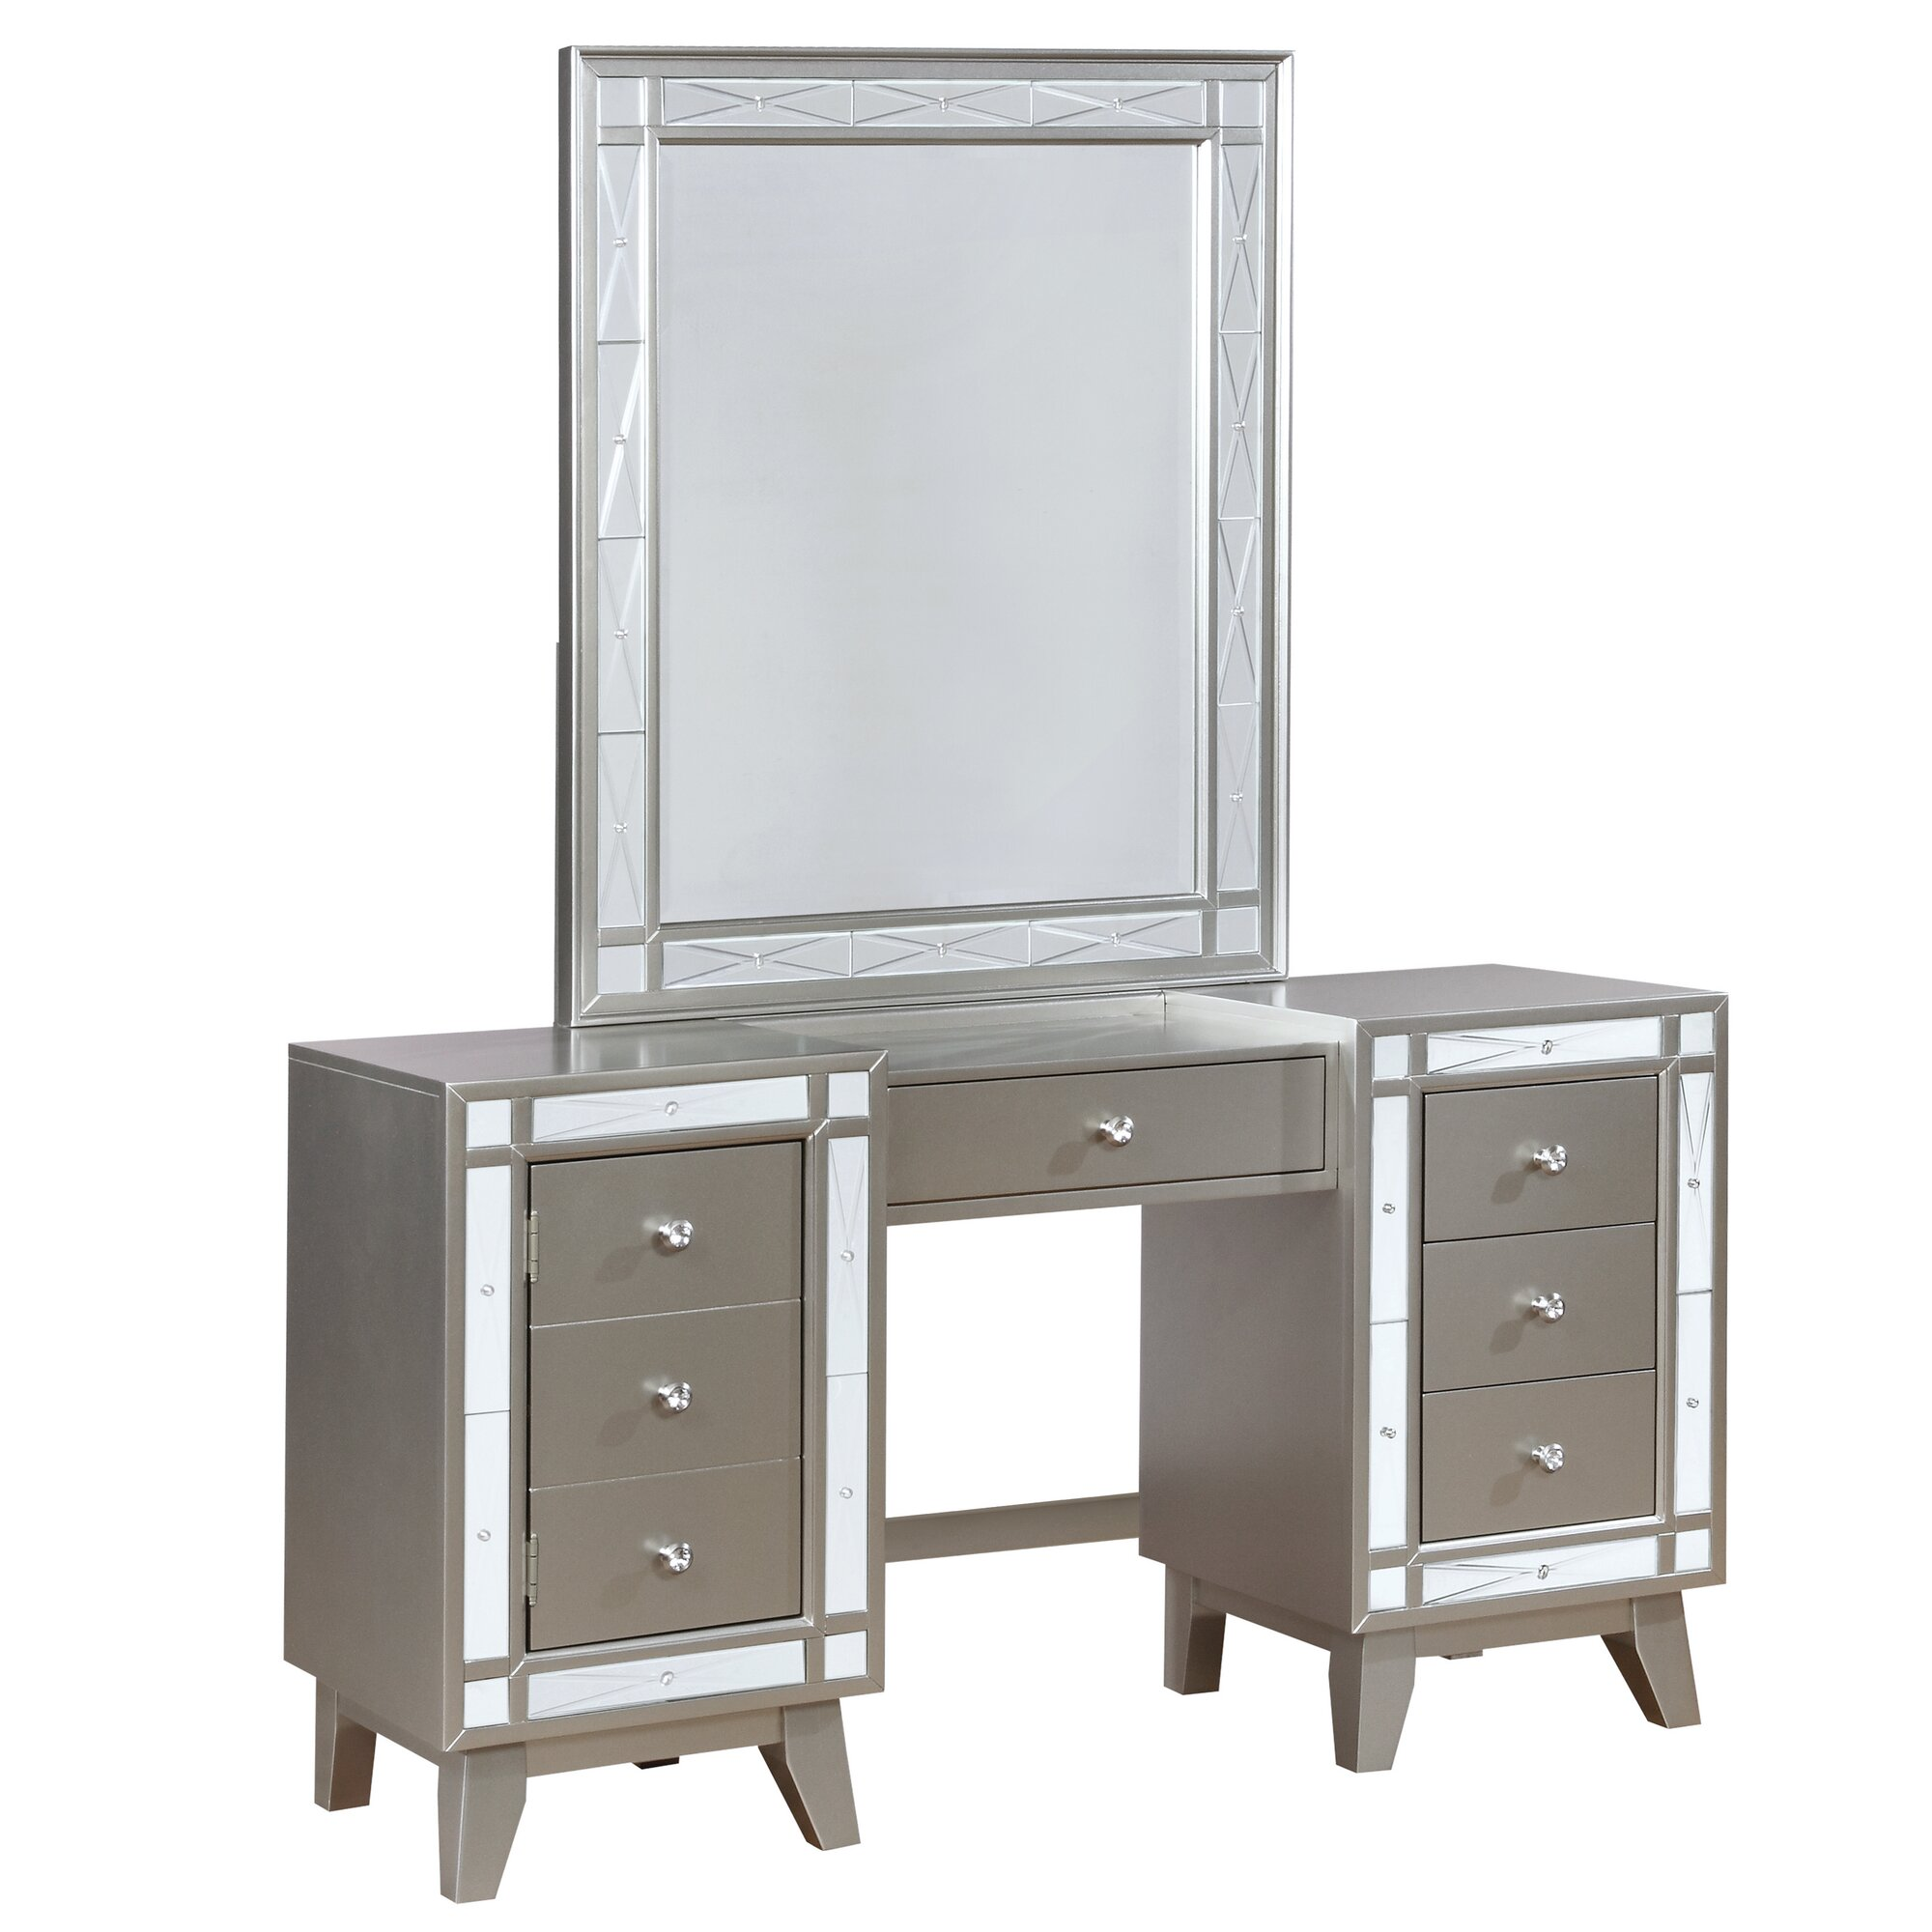 Willa arlo interiors alessia vanity set reviews wayfair - Willa arlo interiors keeley bar cart ...